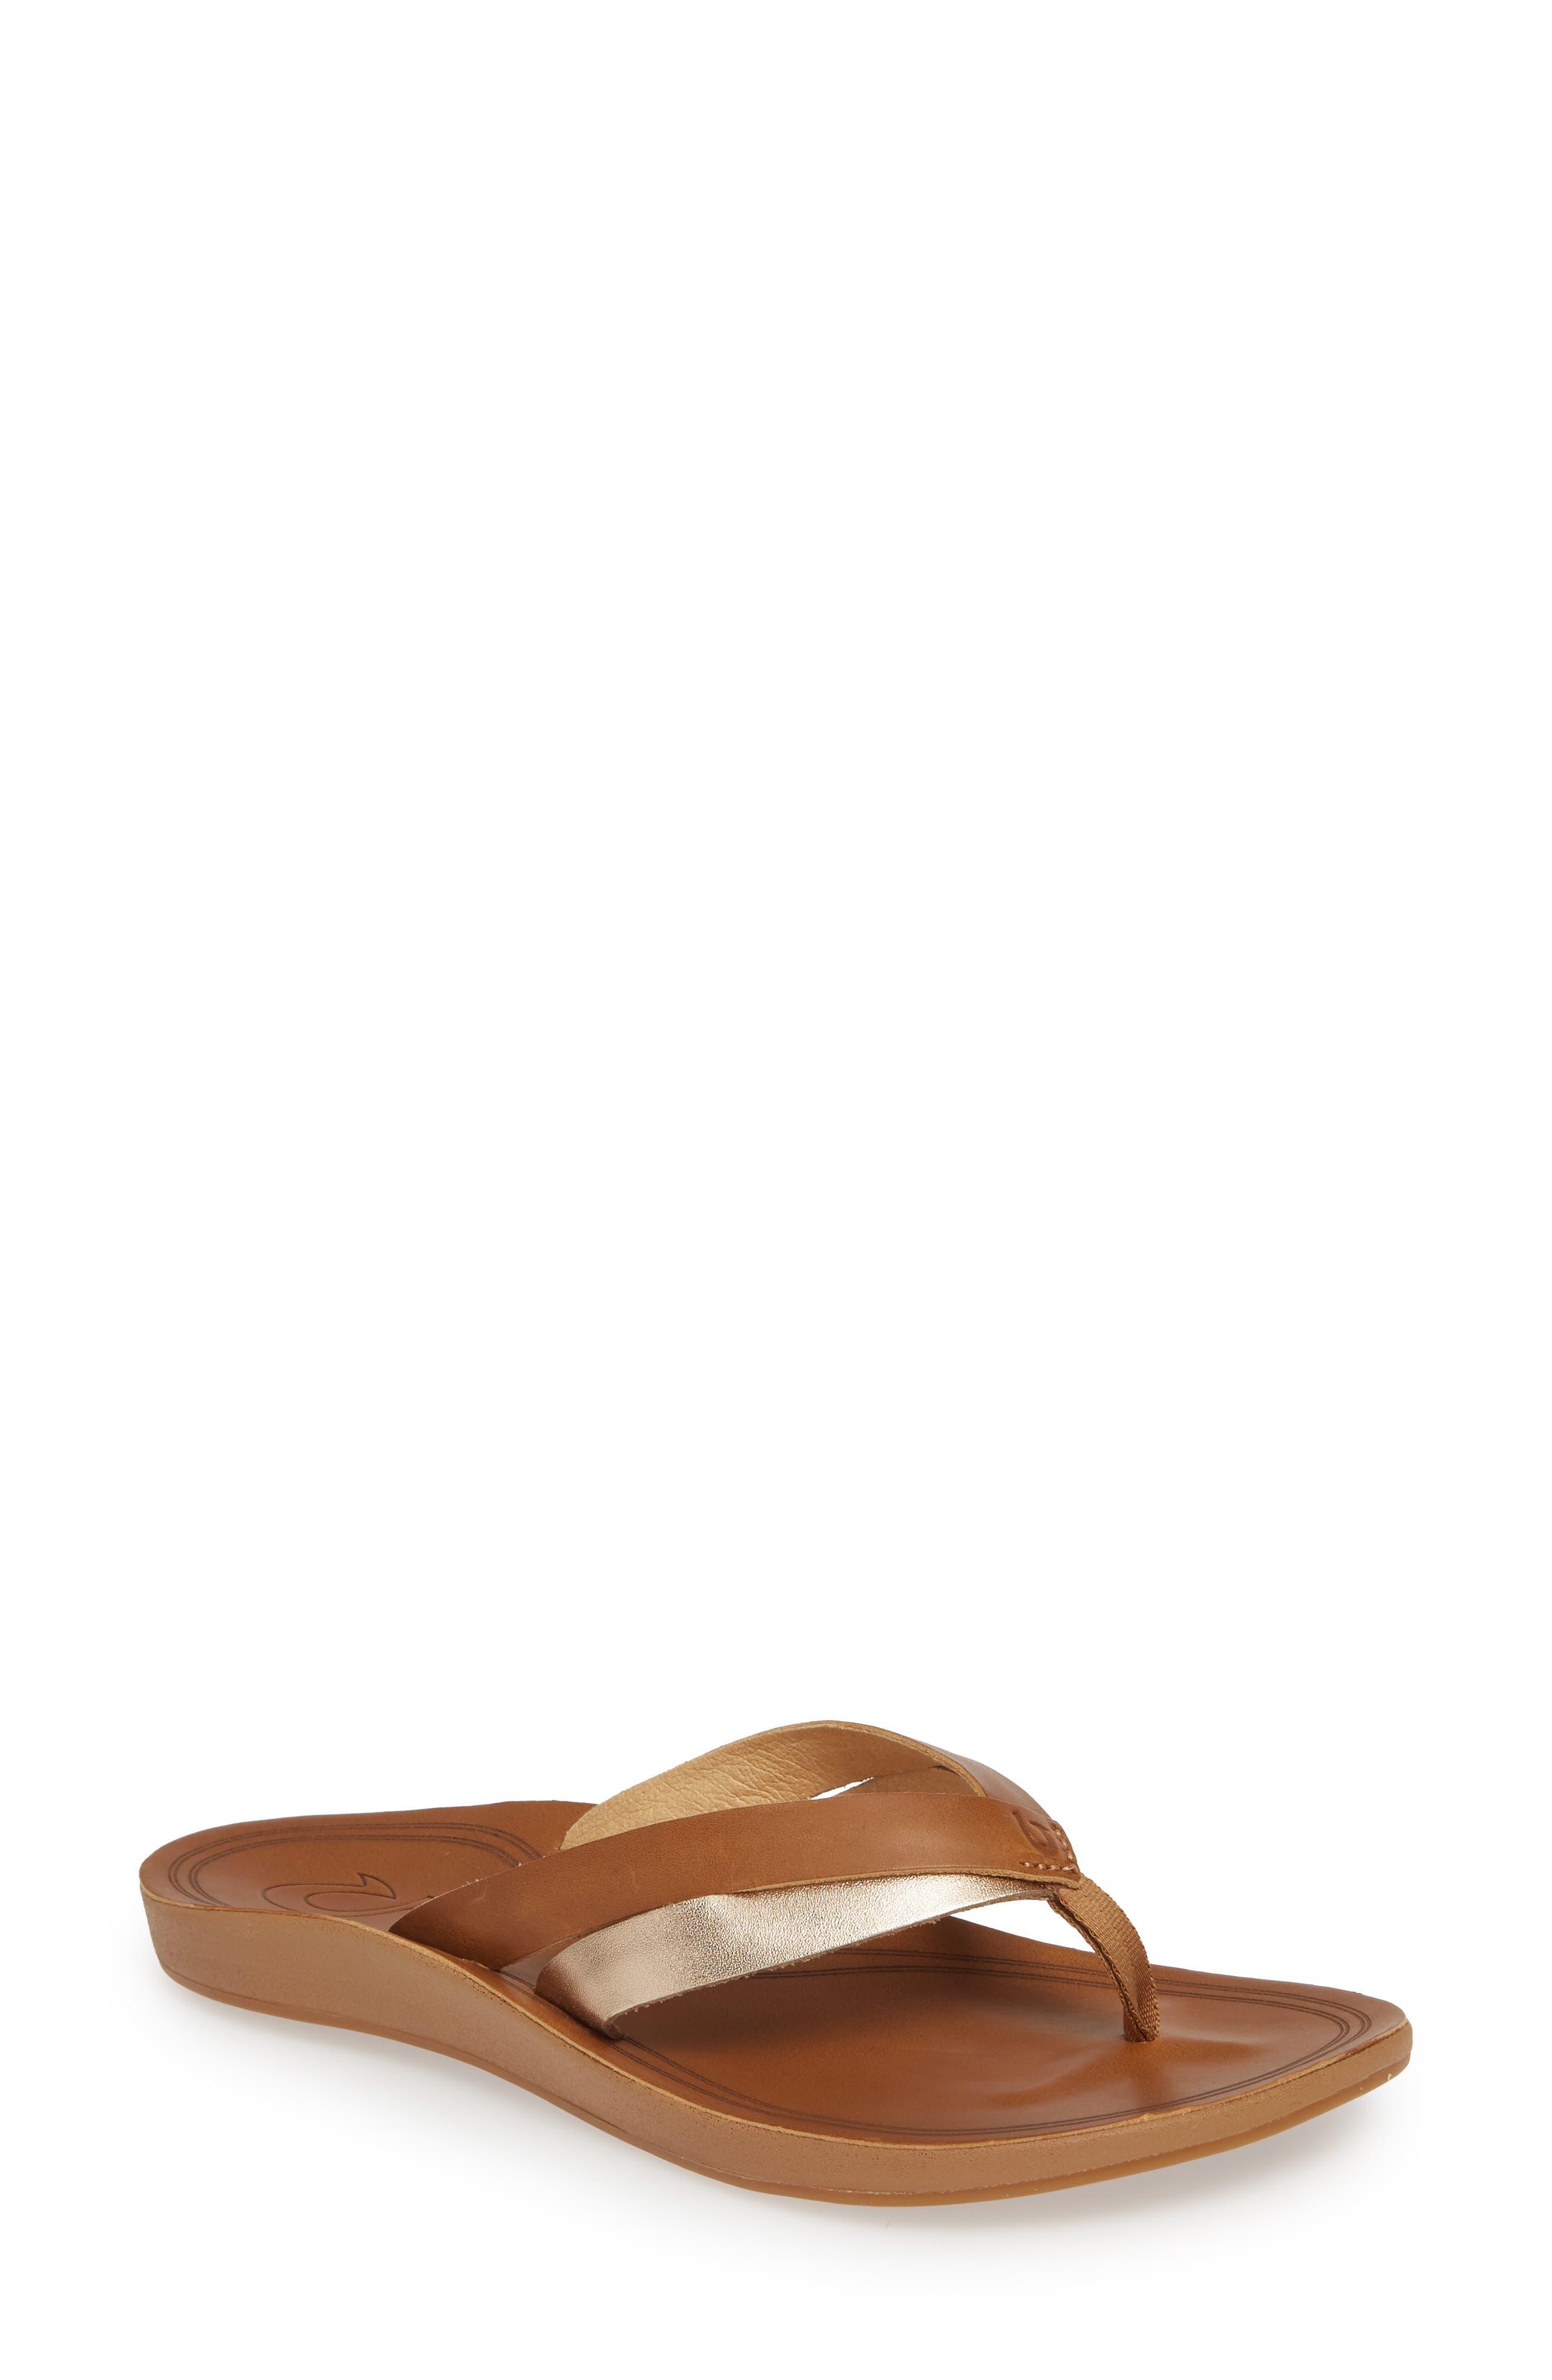 Olukai Kaekae Flip Flop, Brown